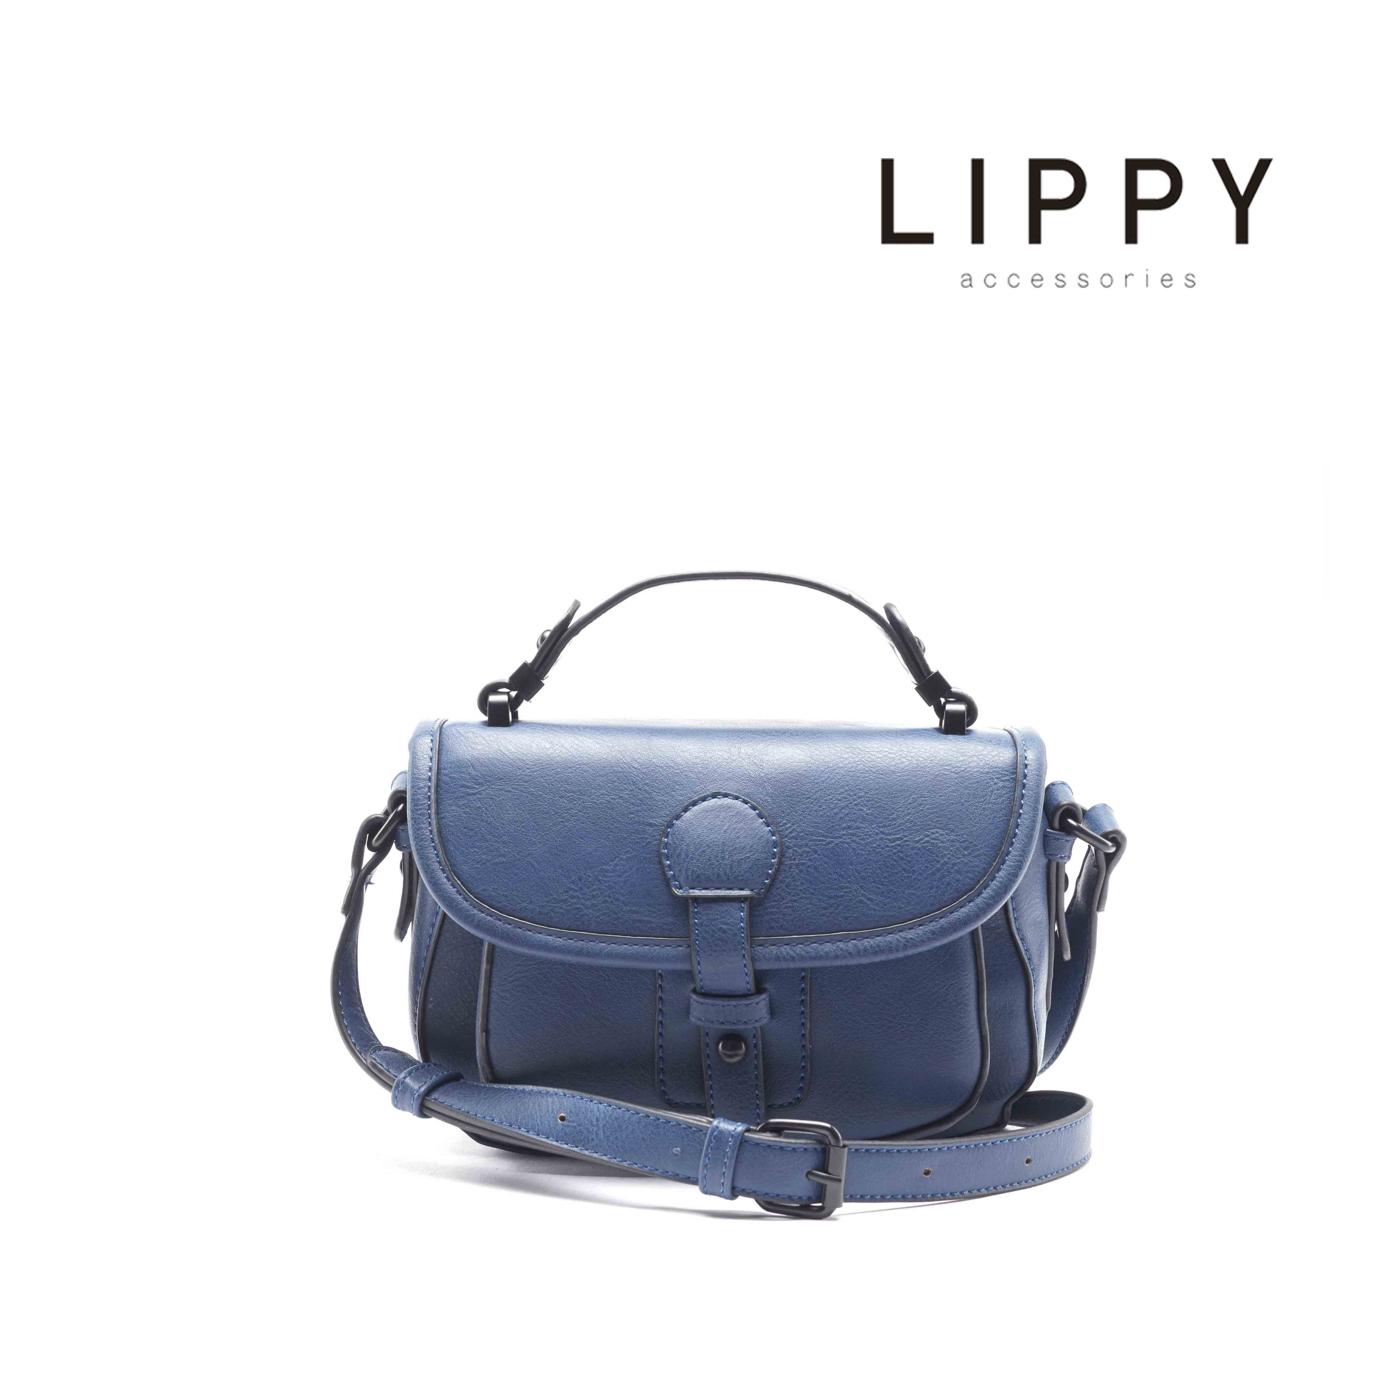 LIPPY 巴塞隆納的邂逅 Crossbody Mini迷你側背包【AS316091947】